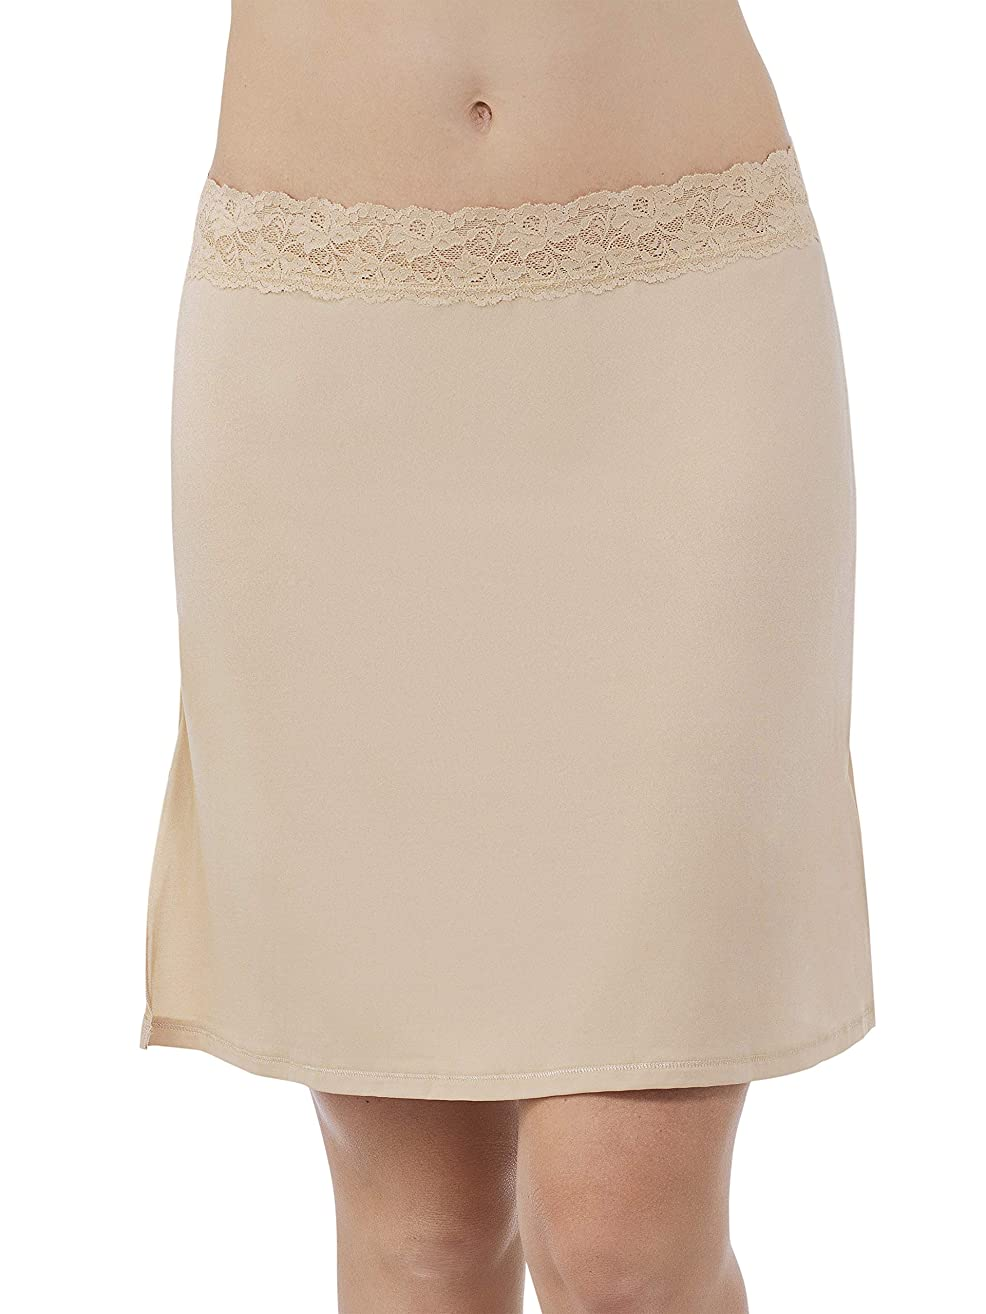 Vassarette Women's Adjustable Waist Half Slip 11073